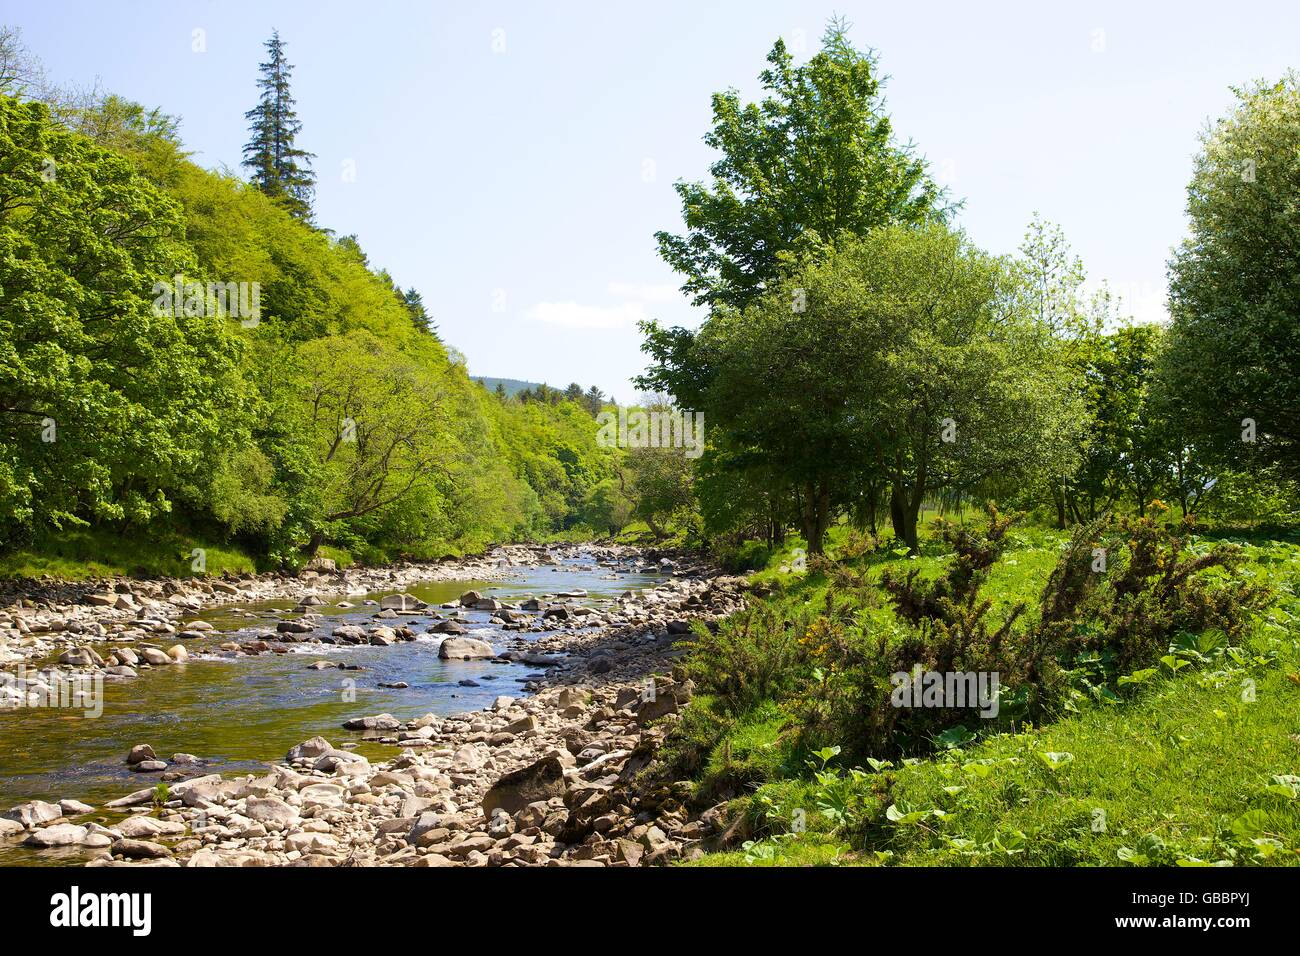 South Tyne river. Alston, Cumbria, England, United Kingdom, Europe. - Stock Image